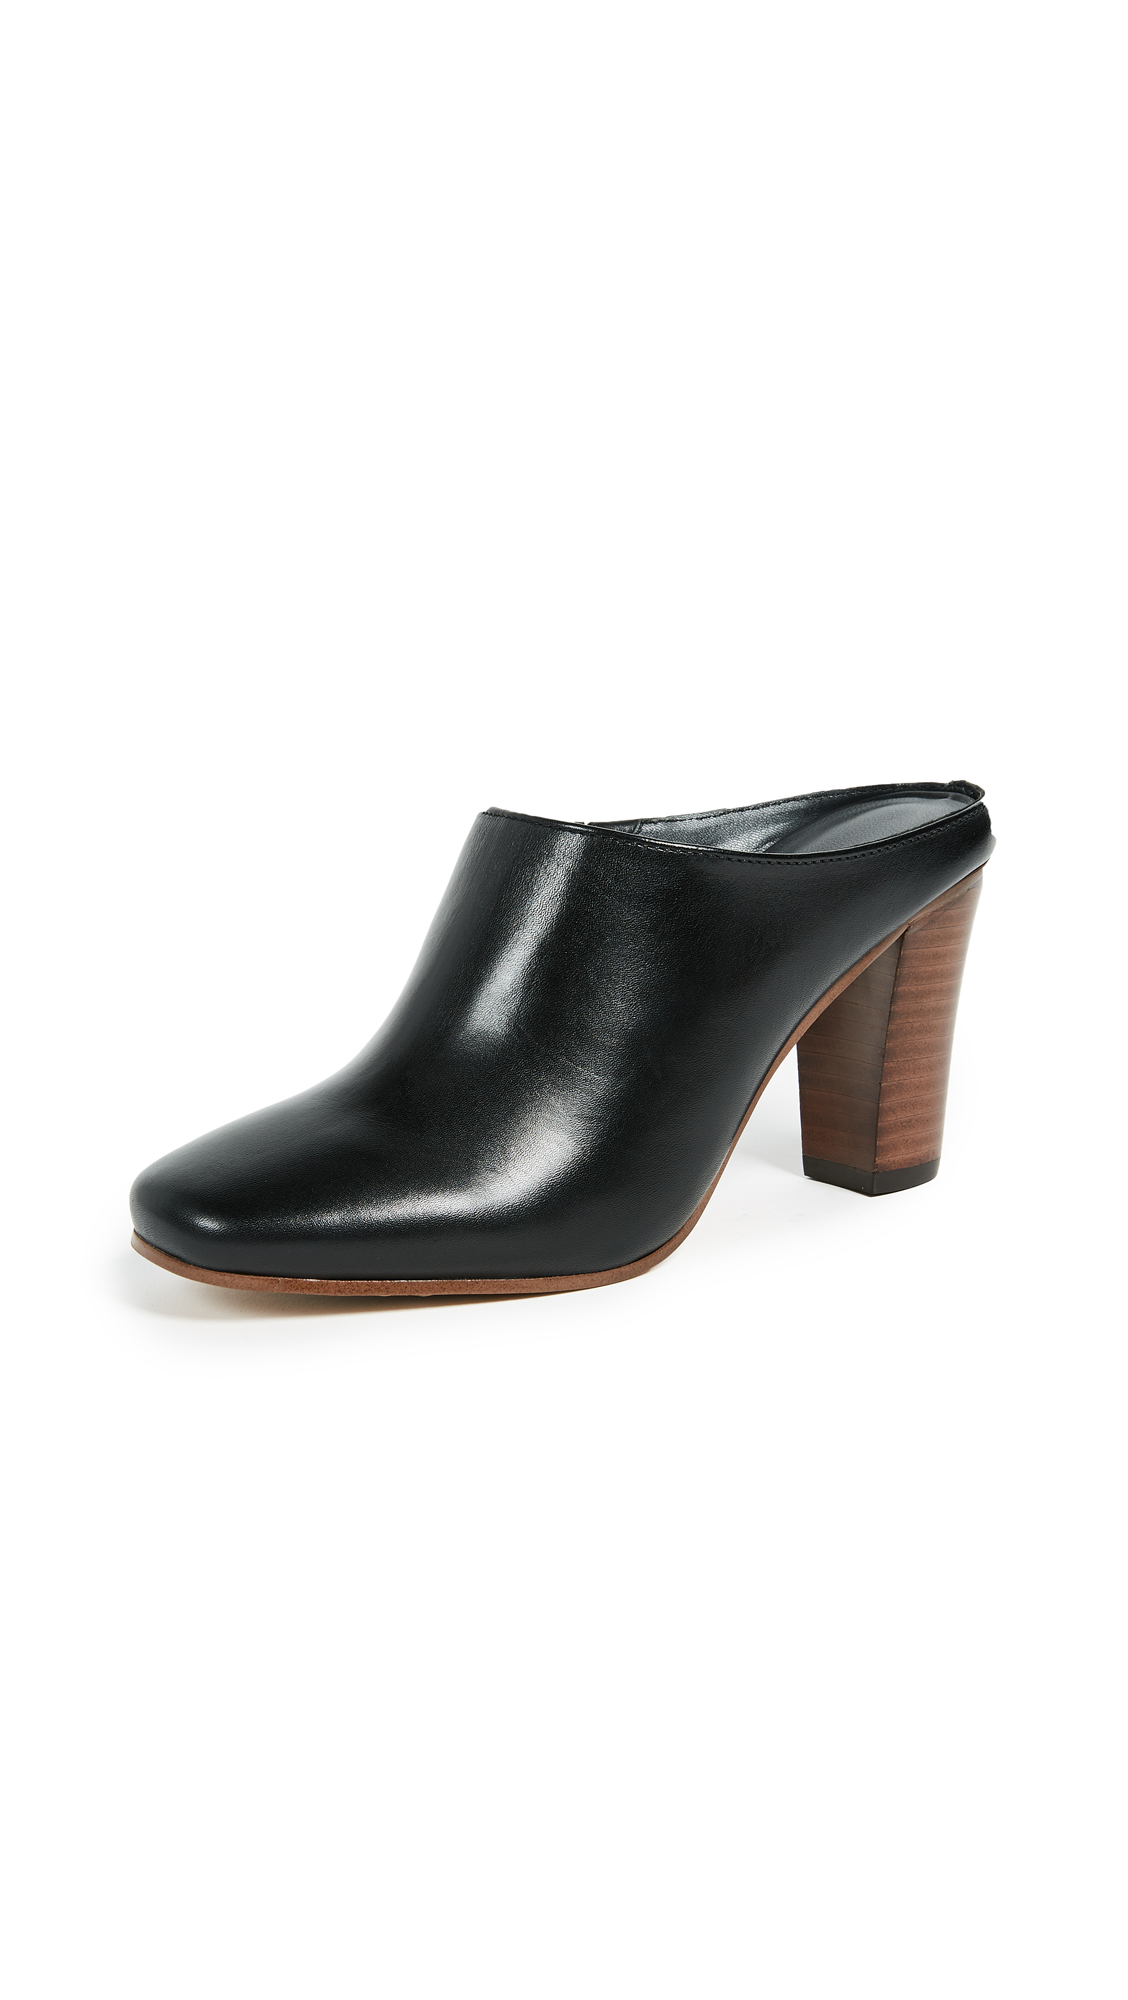 Botkier Sherri Block Heel Mules - Black